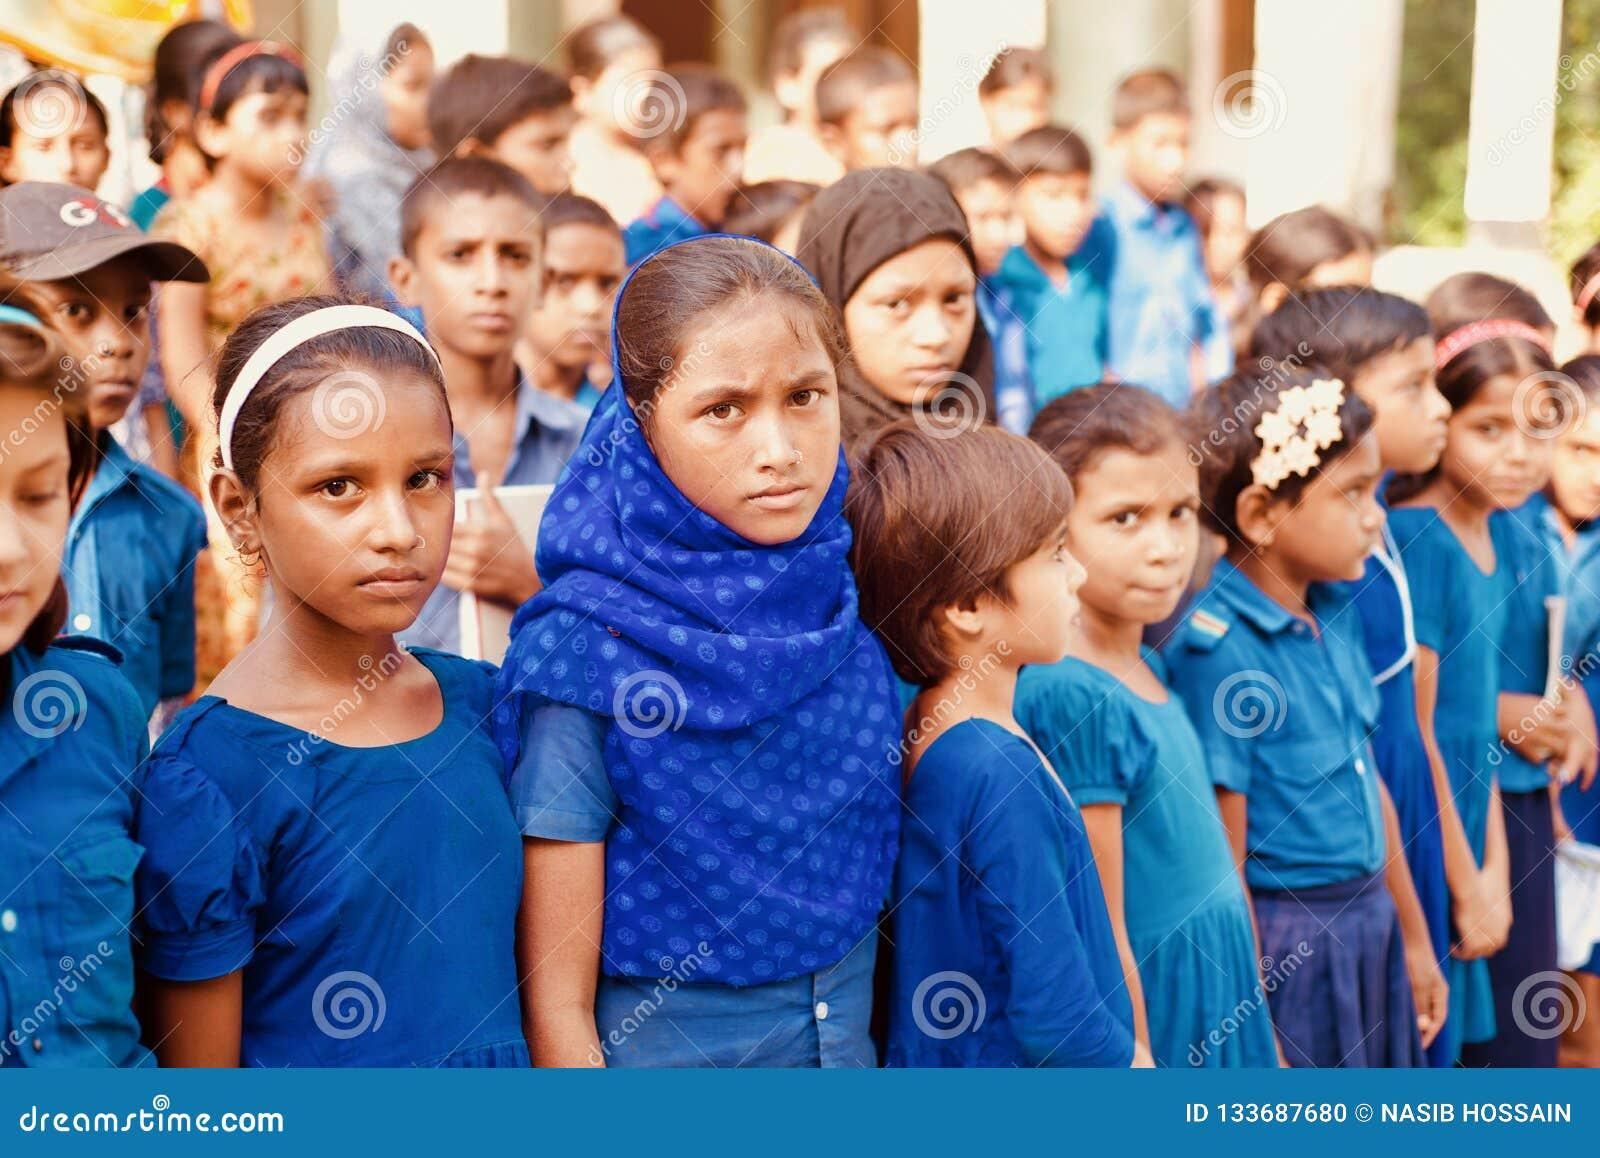 School children standing in a group unique photo